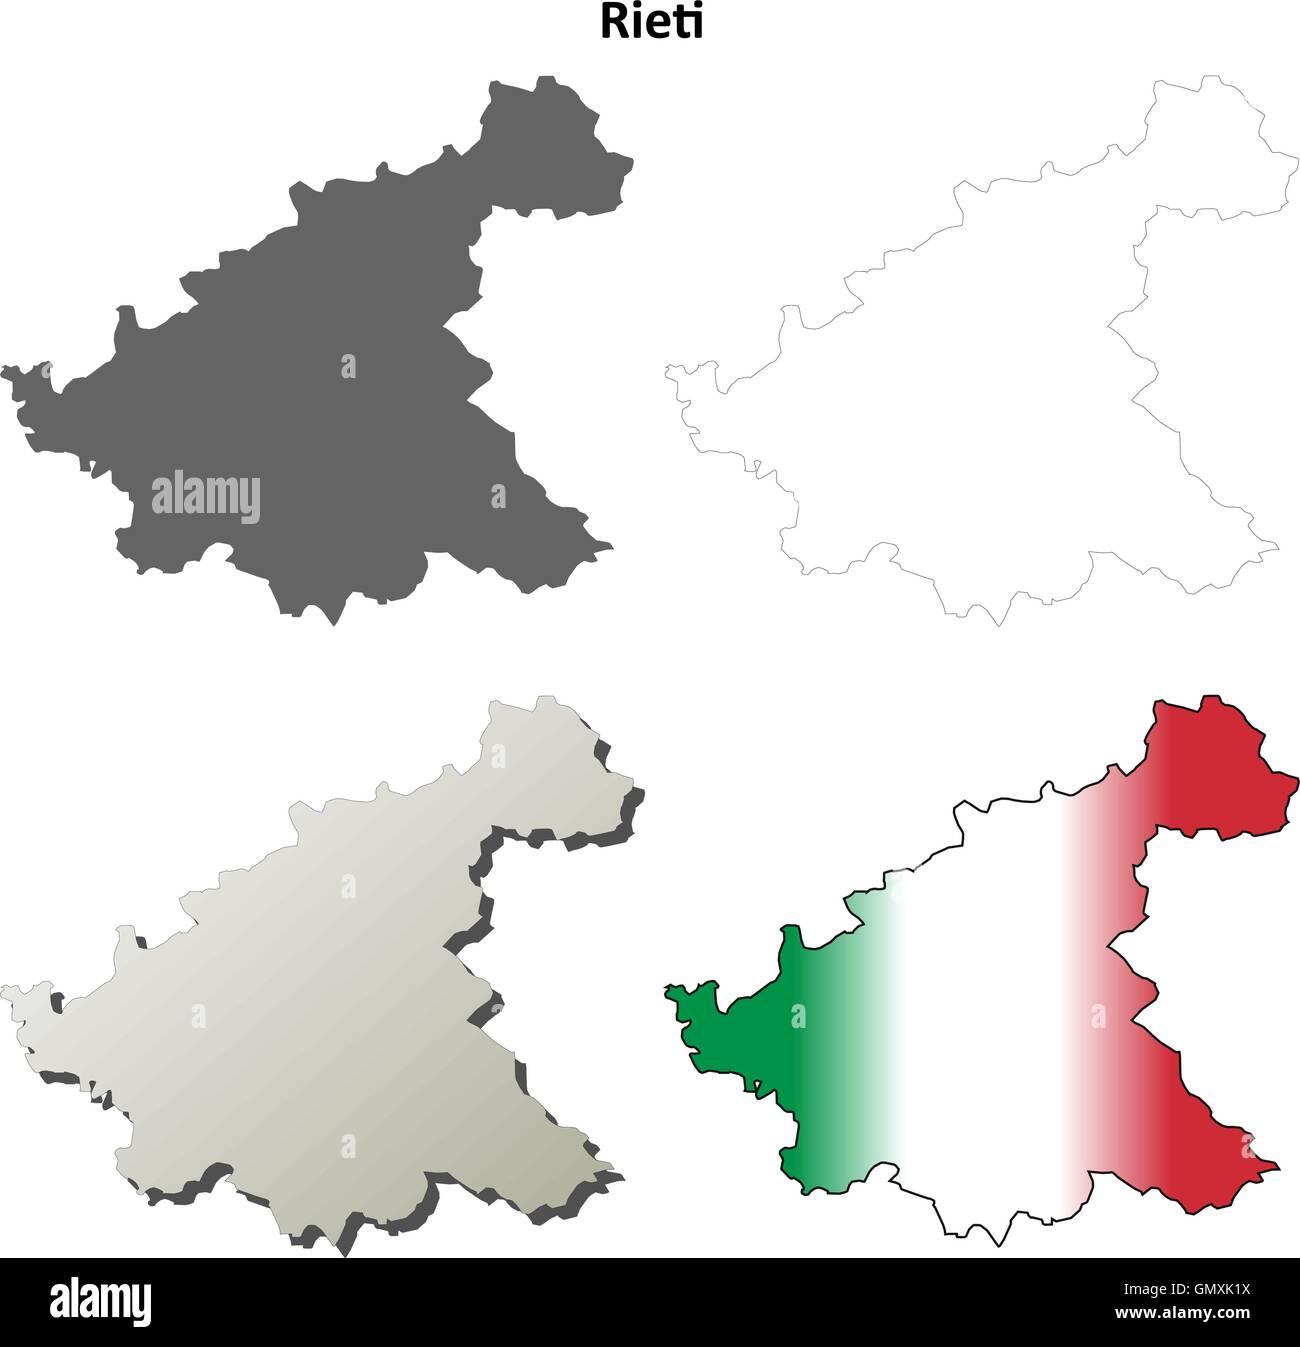 Rieti Italy Map.Rieti Italy Stock Vector Images Alamy